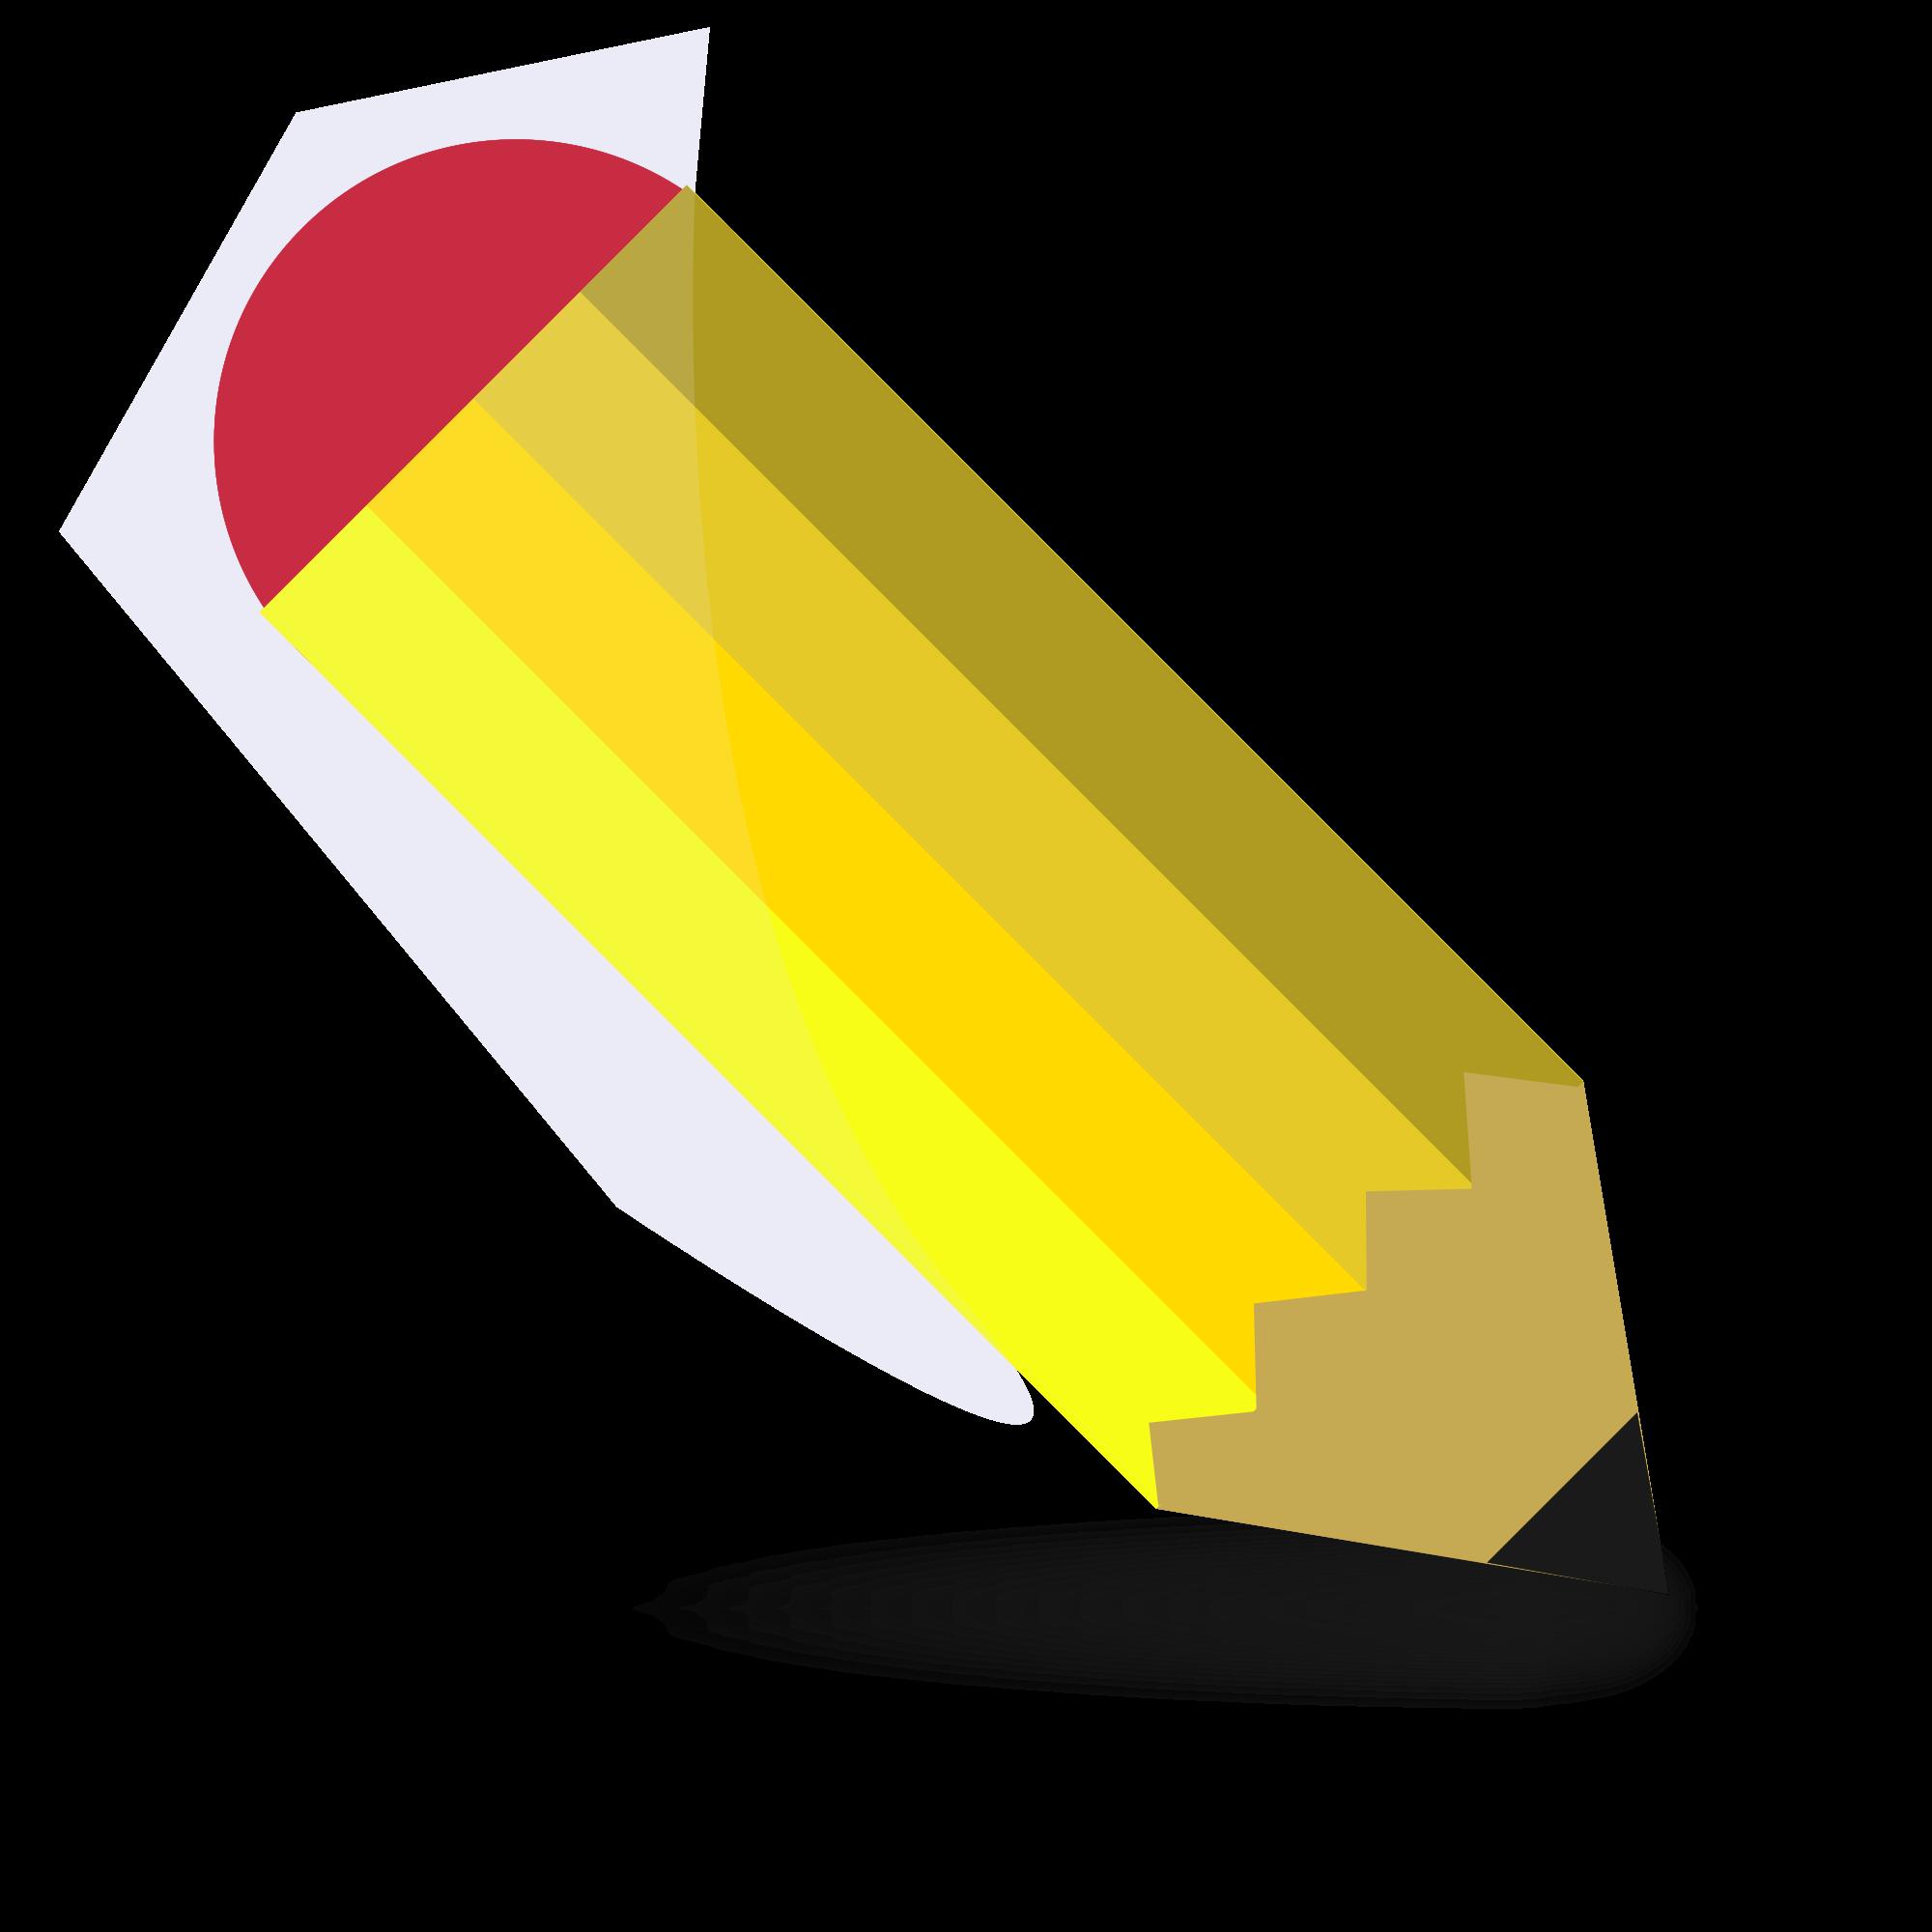 Pencil clipart logo. File svg wikimedia commons